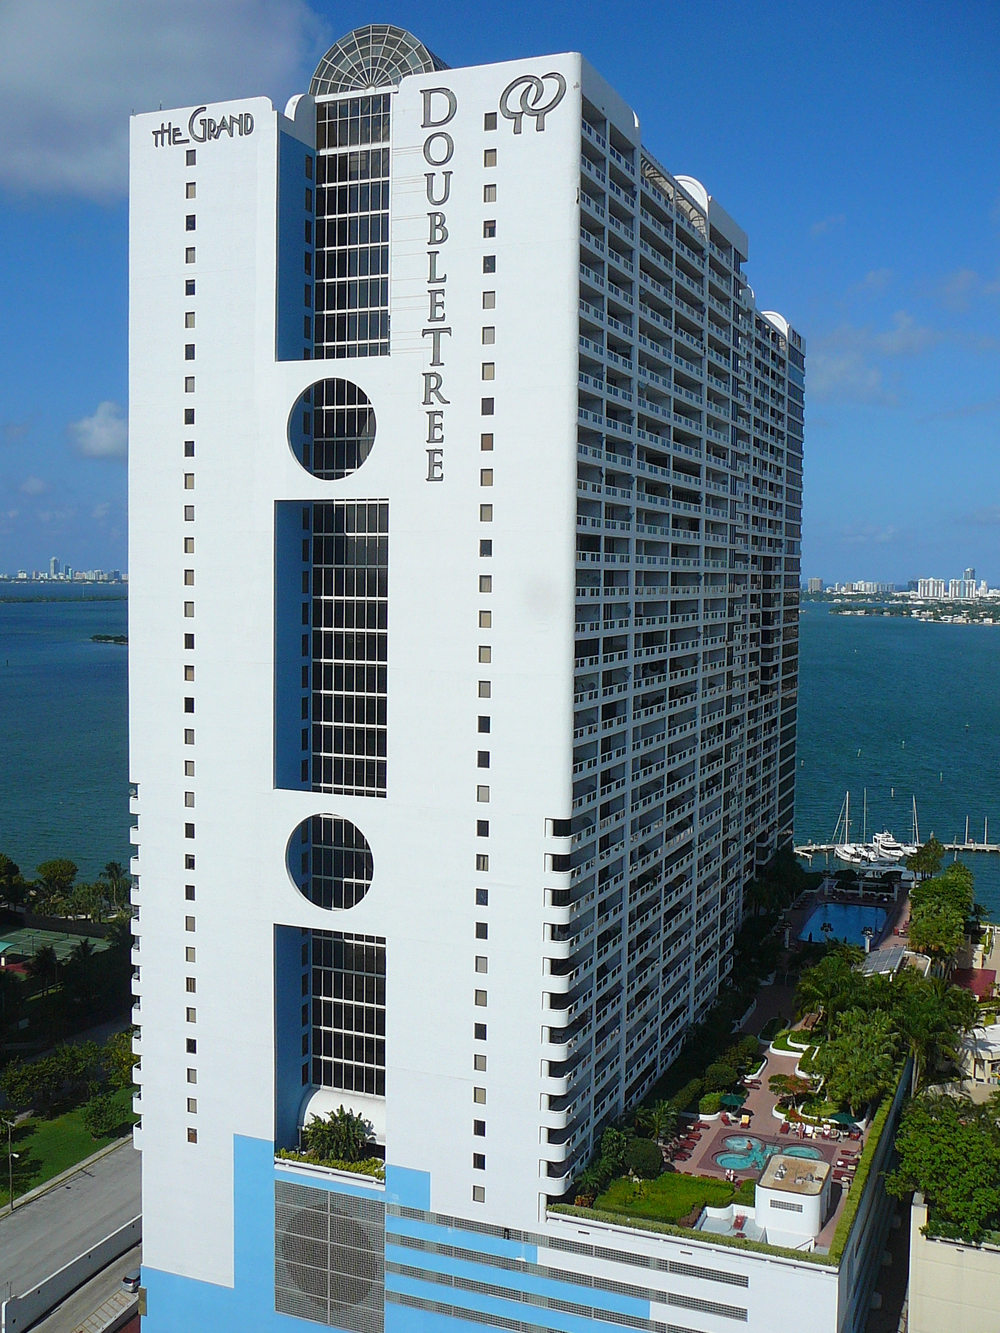 Doubletree_Grand_Hotel_Biscayne_Bay.jpg